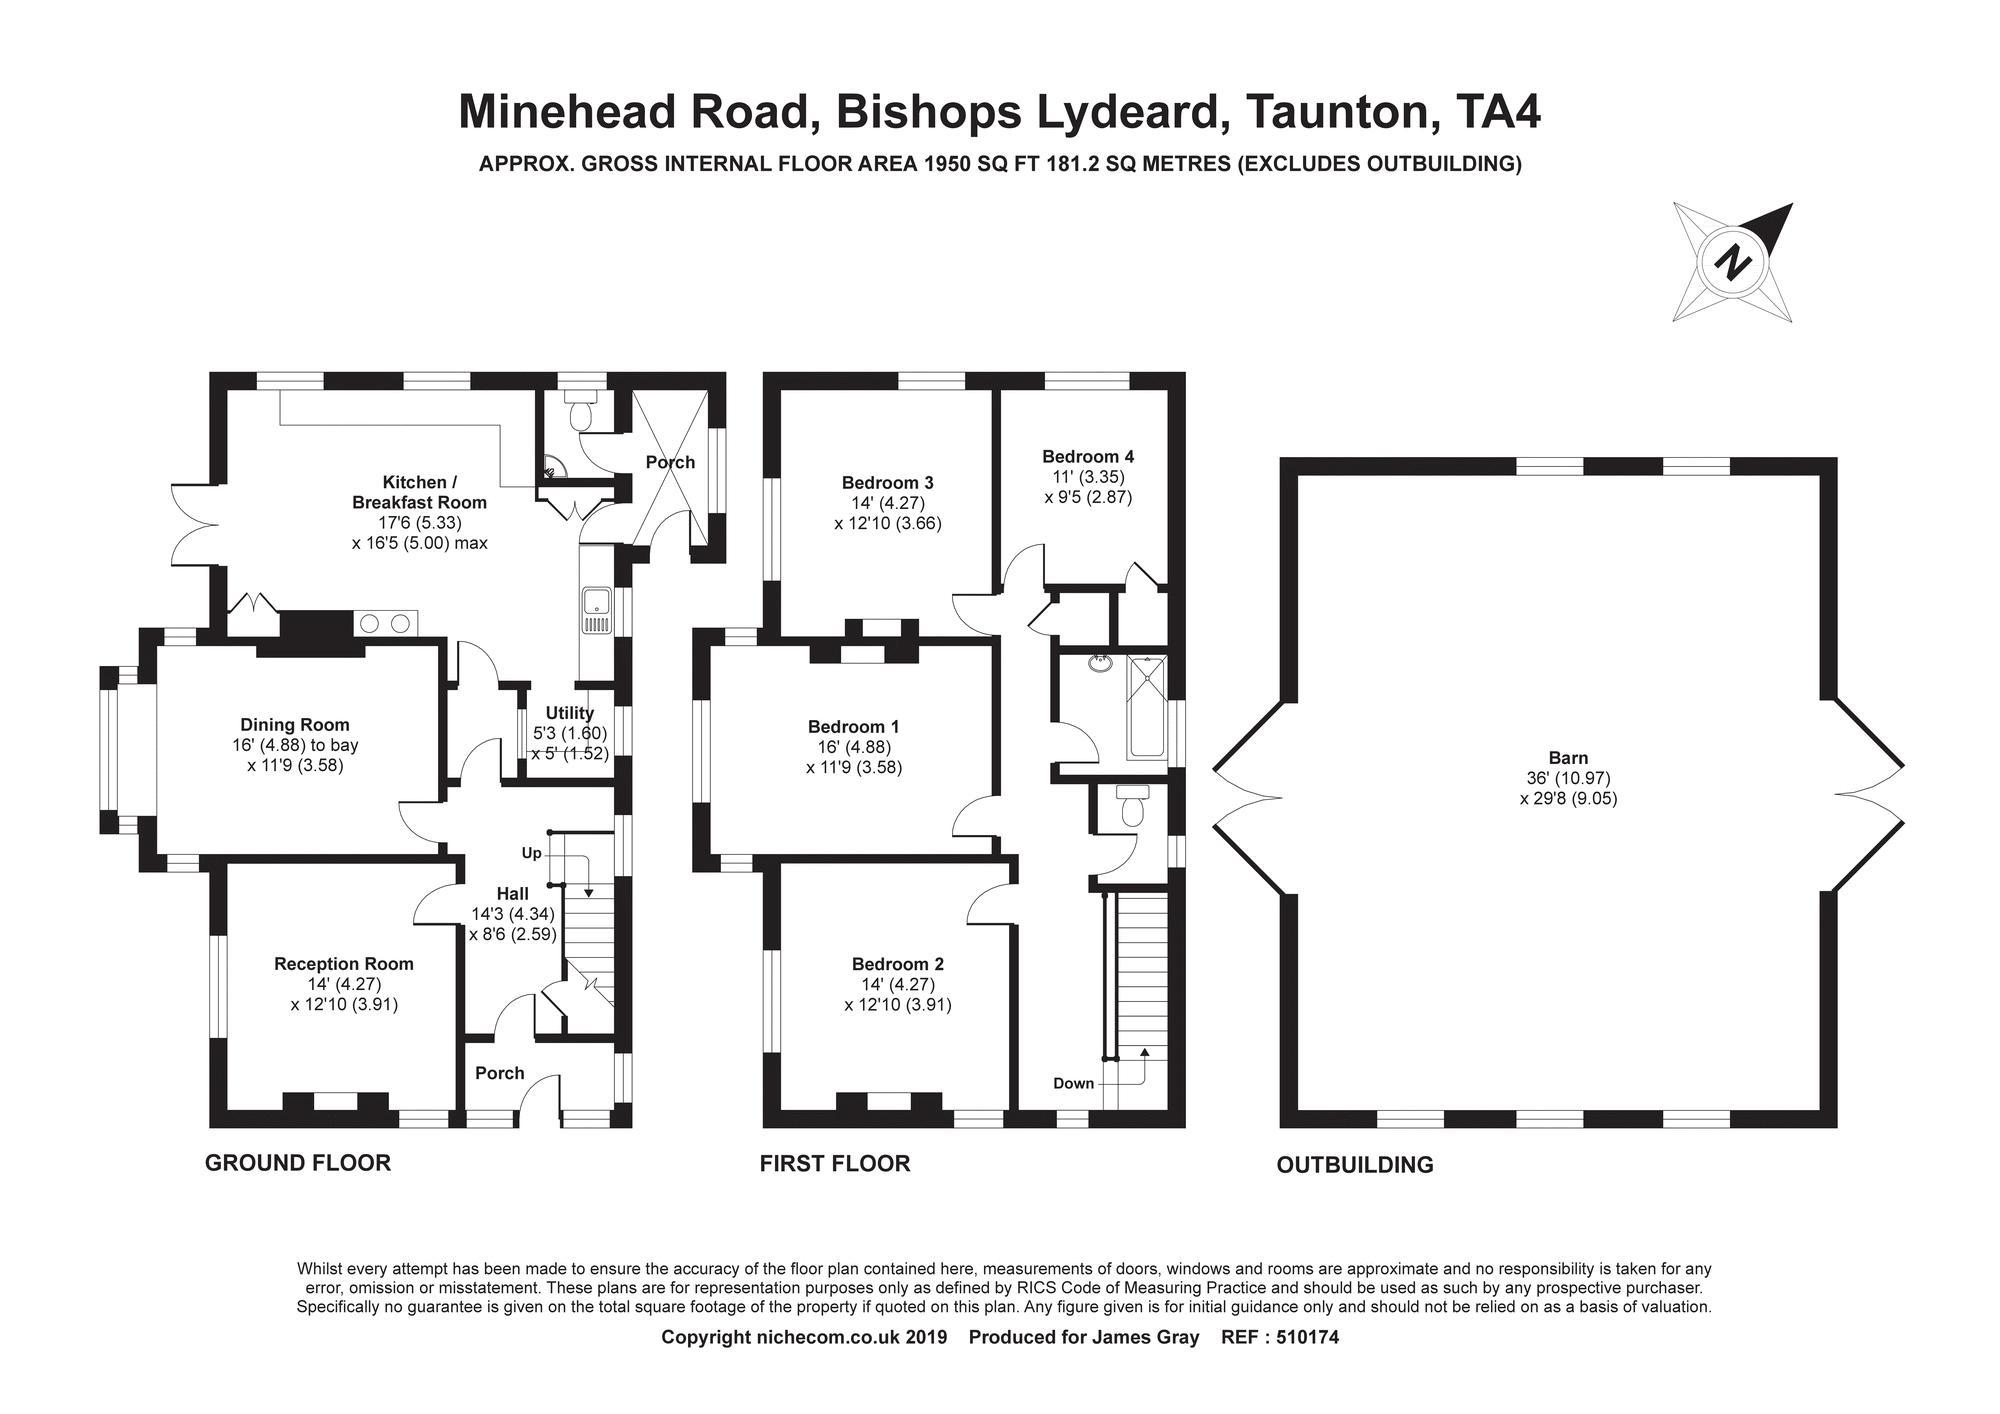 Minehead Road Bishops Lydeard